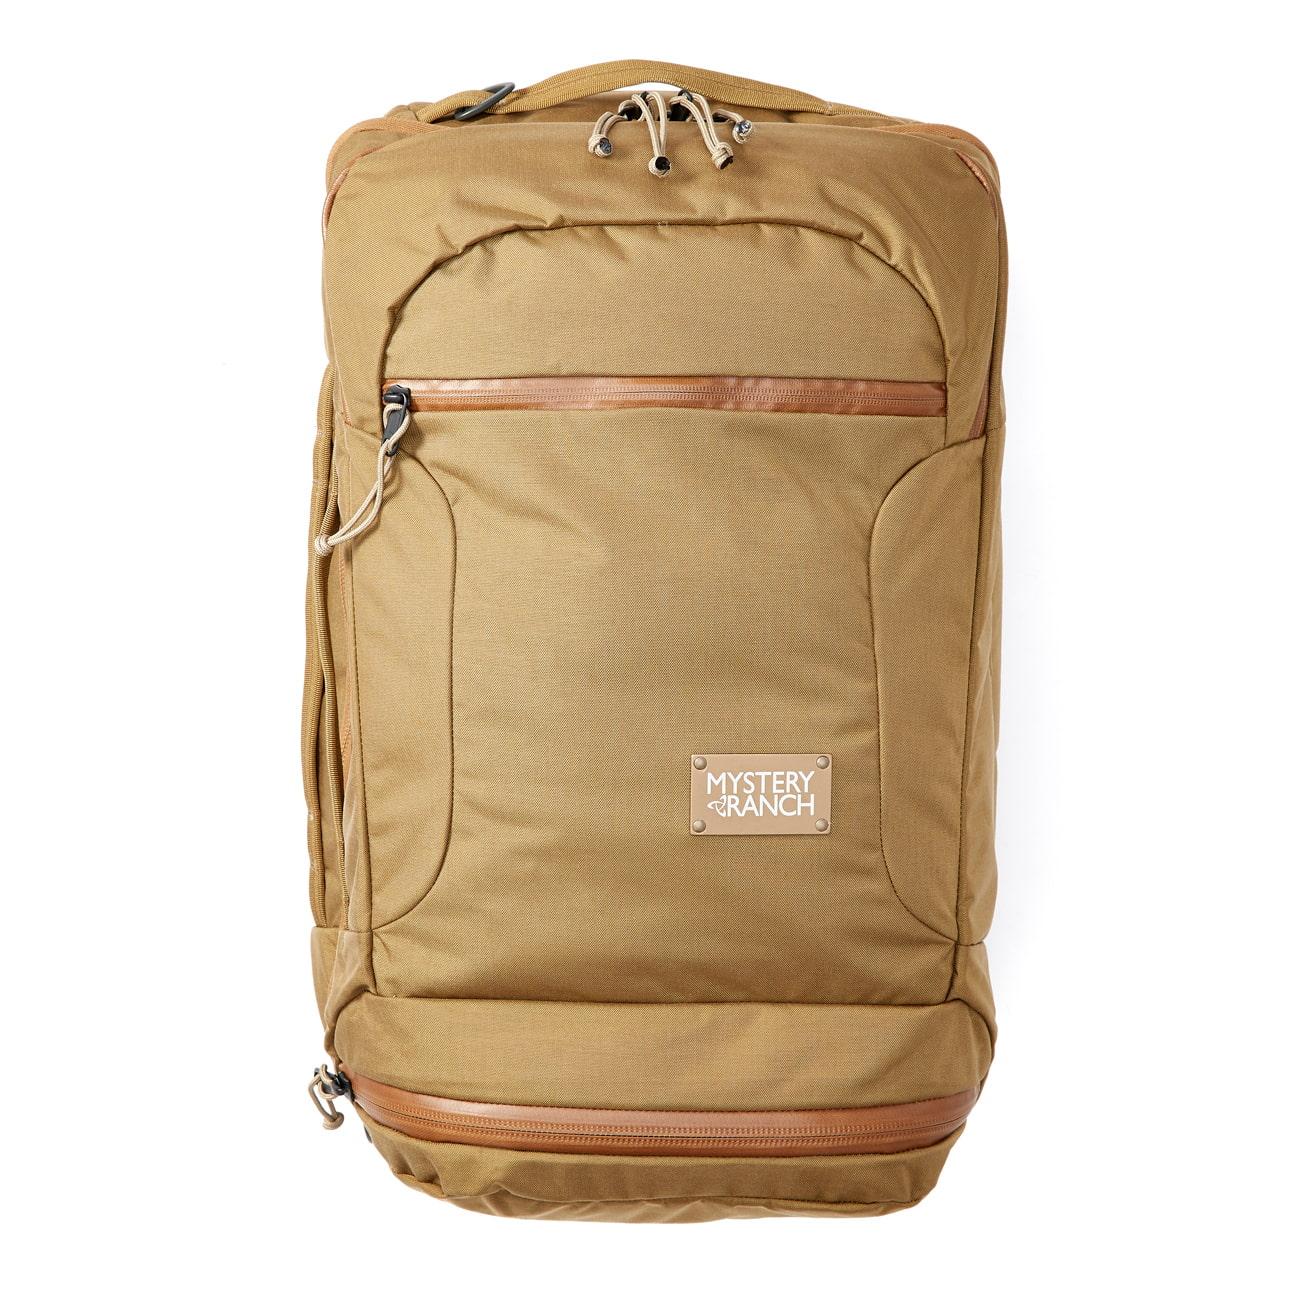 One-Bag Travel Backpack